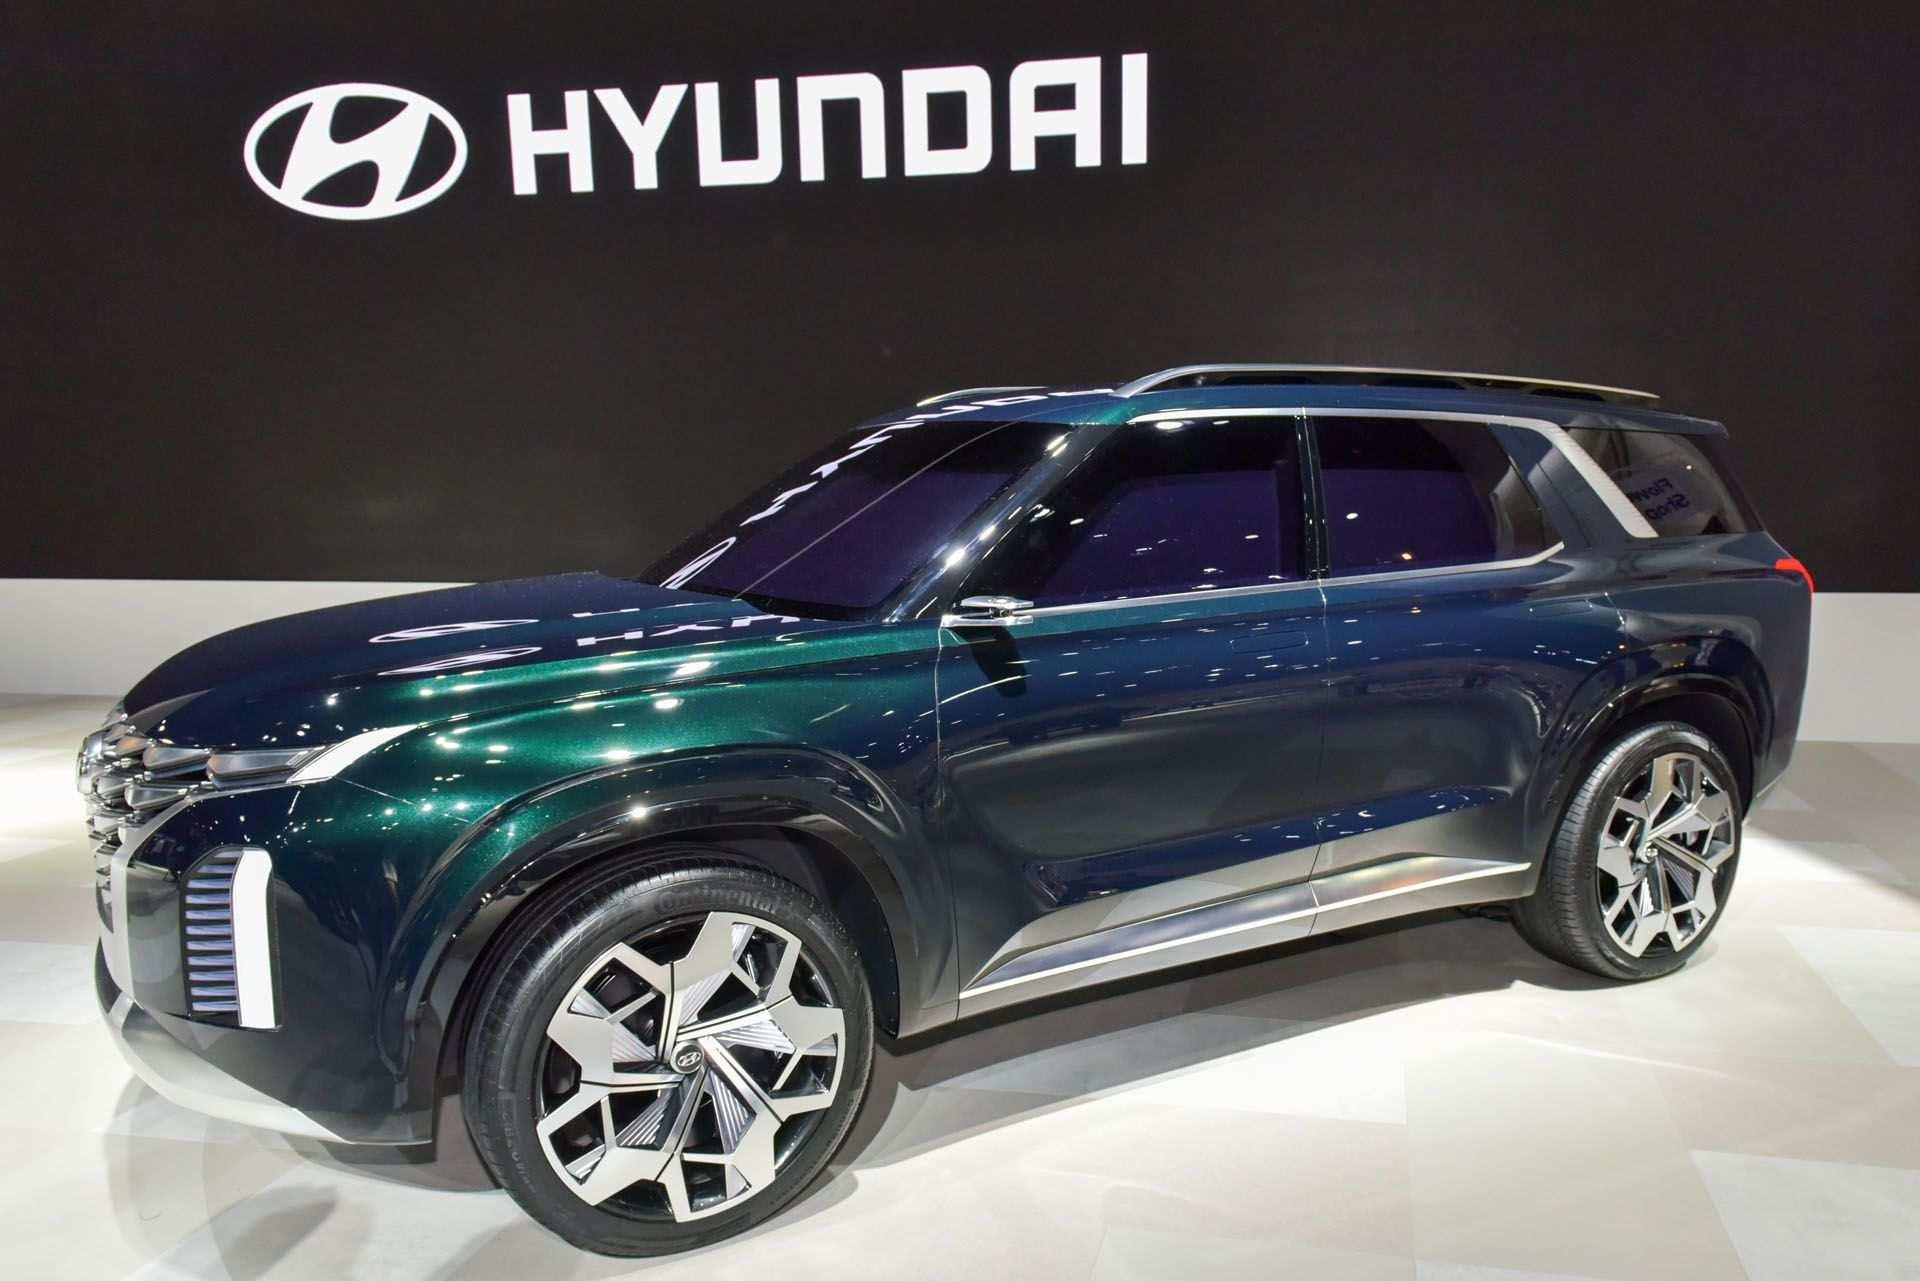 50 Great Cost Of 2020 Hyundai Palisade New Concept with Cost Of 2020 Hyundai Palisade